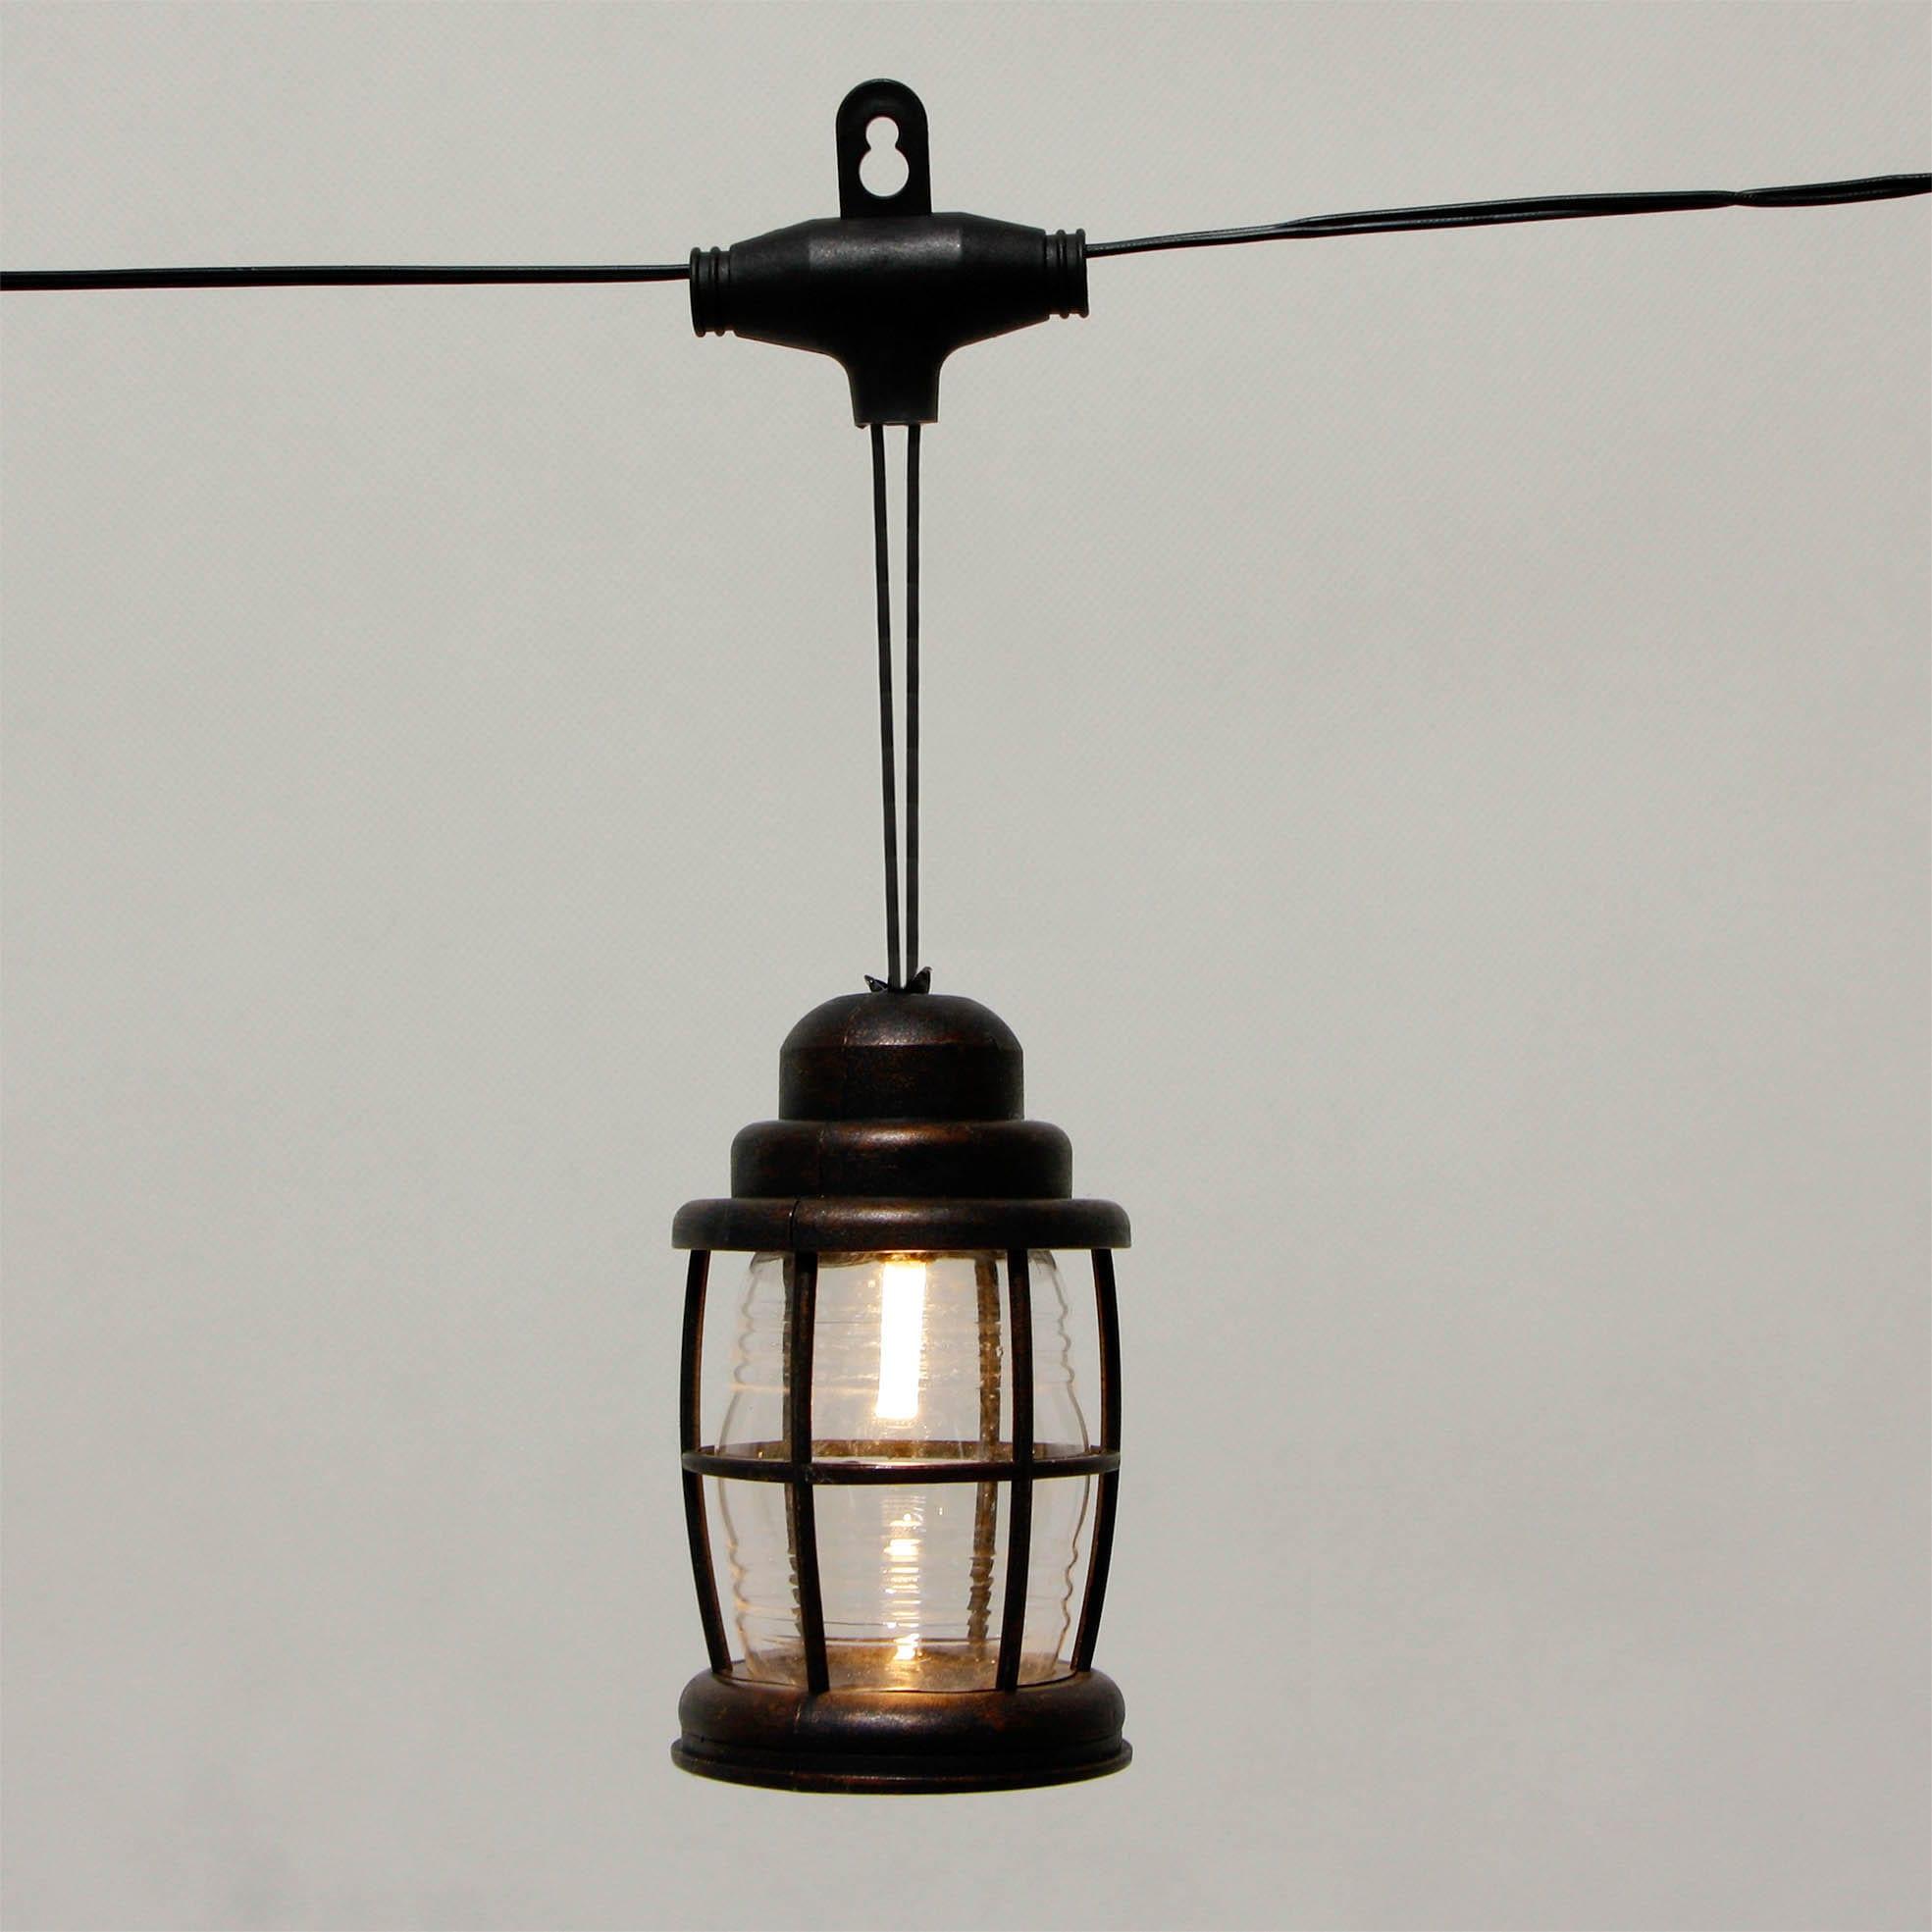 Black Lantern Cover LED Umbrella Lights Decoration KF09060-SO Featured Image